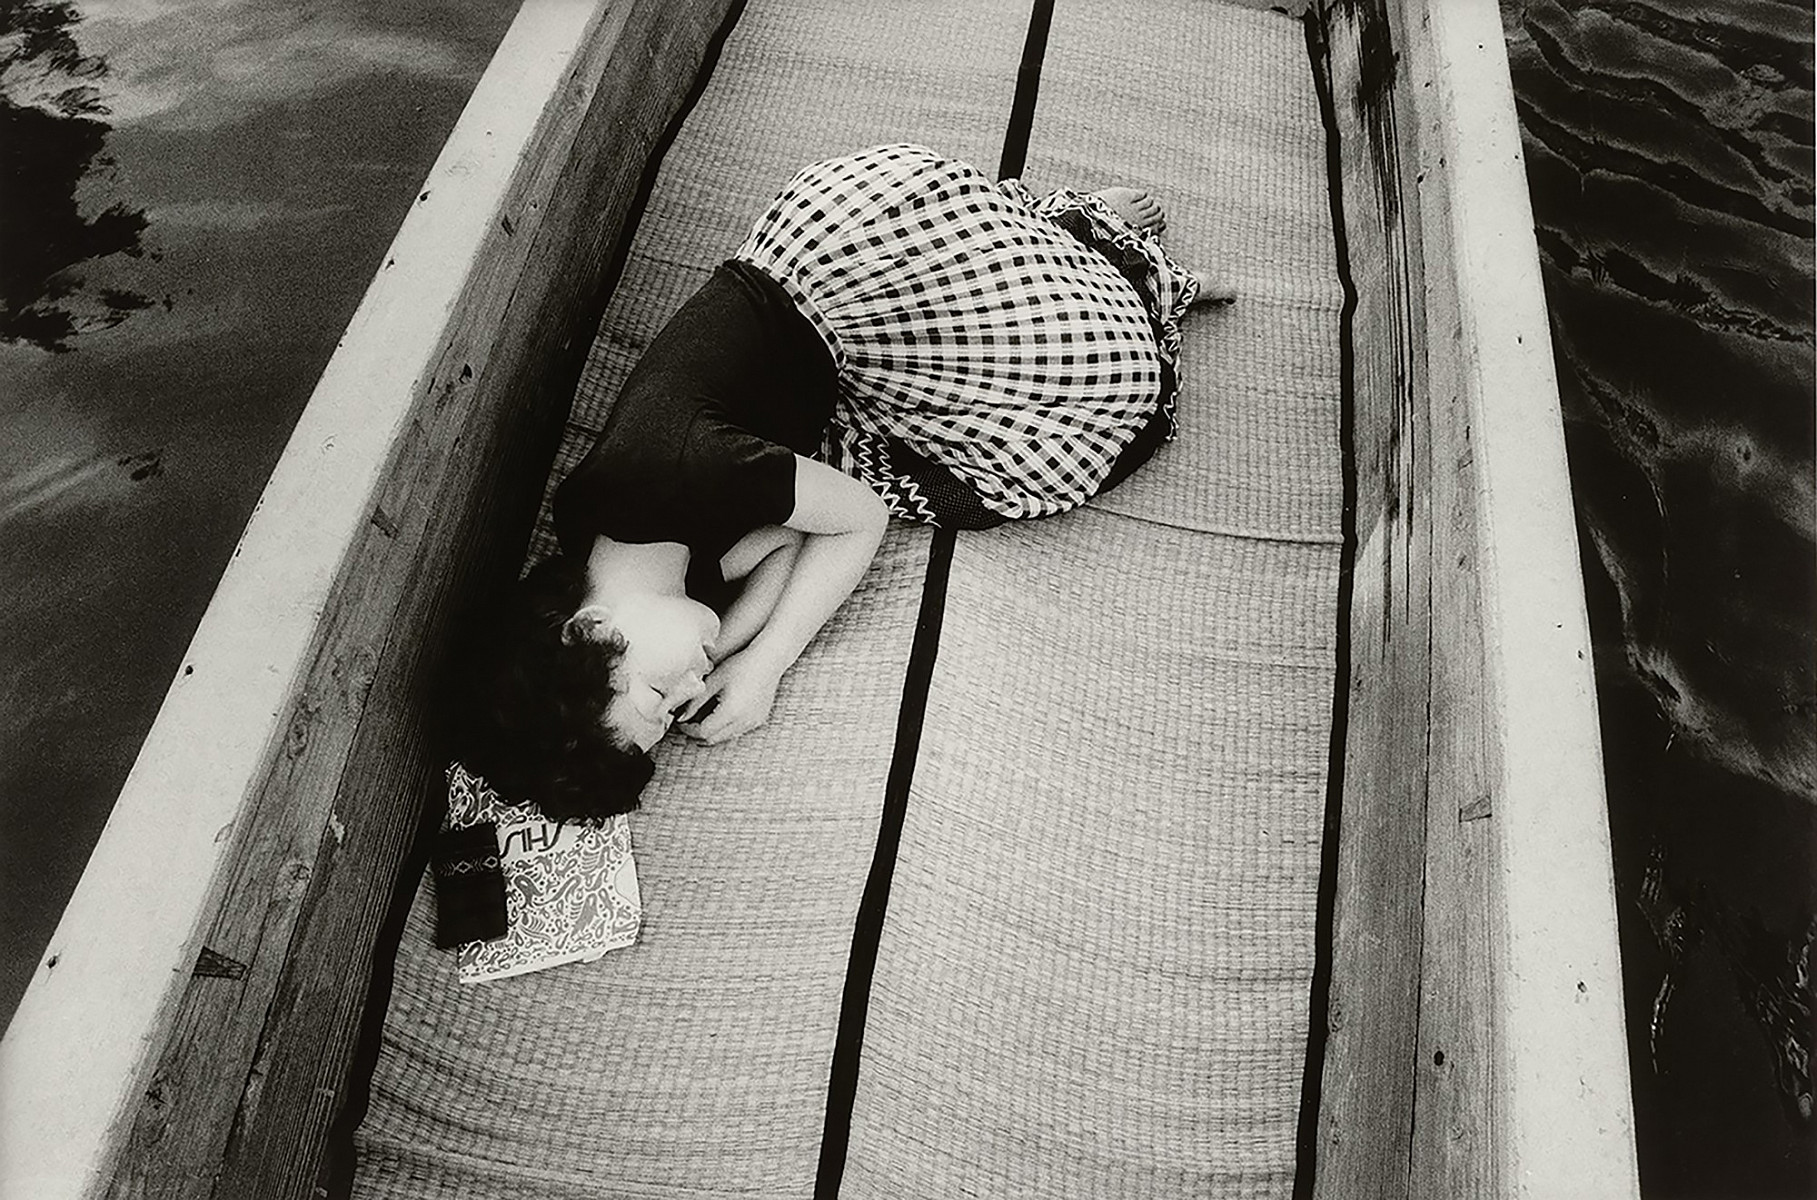 araki_sentimental_journey_1971_c_nobuyoshi_araki